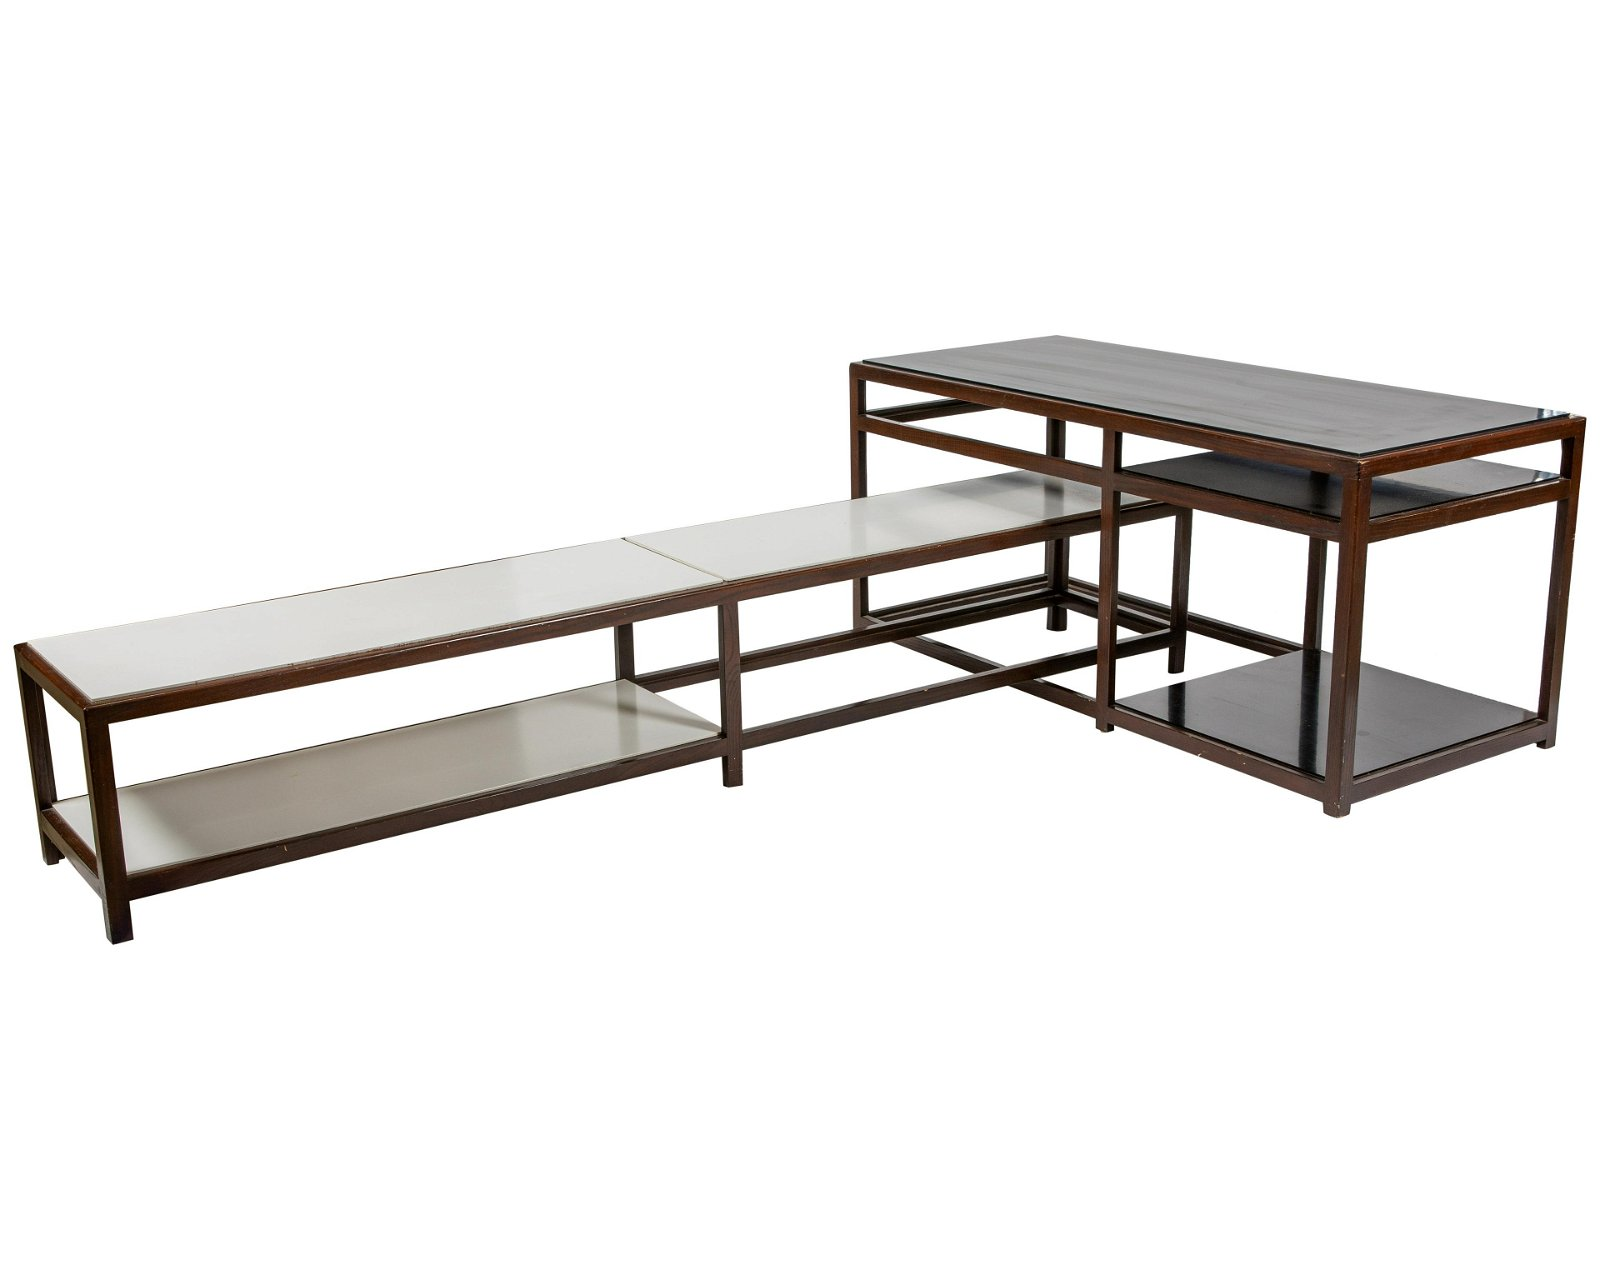 Edward Wormley - Dunbar - Table 5404